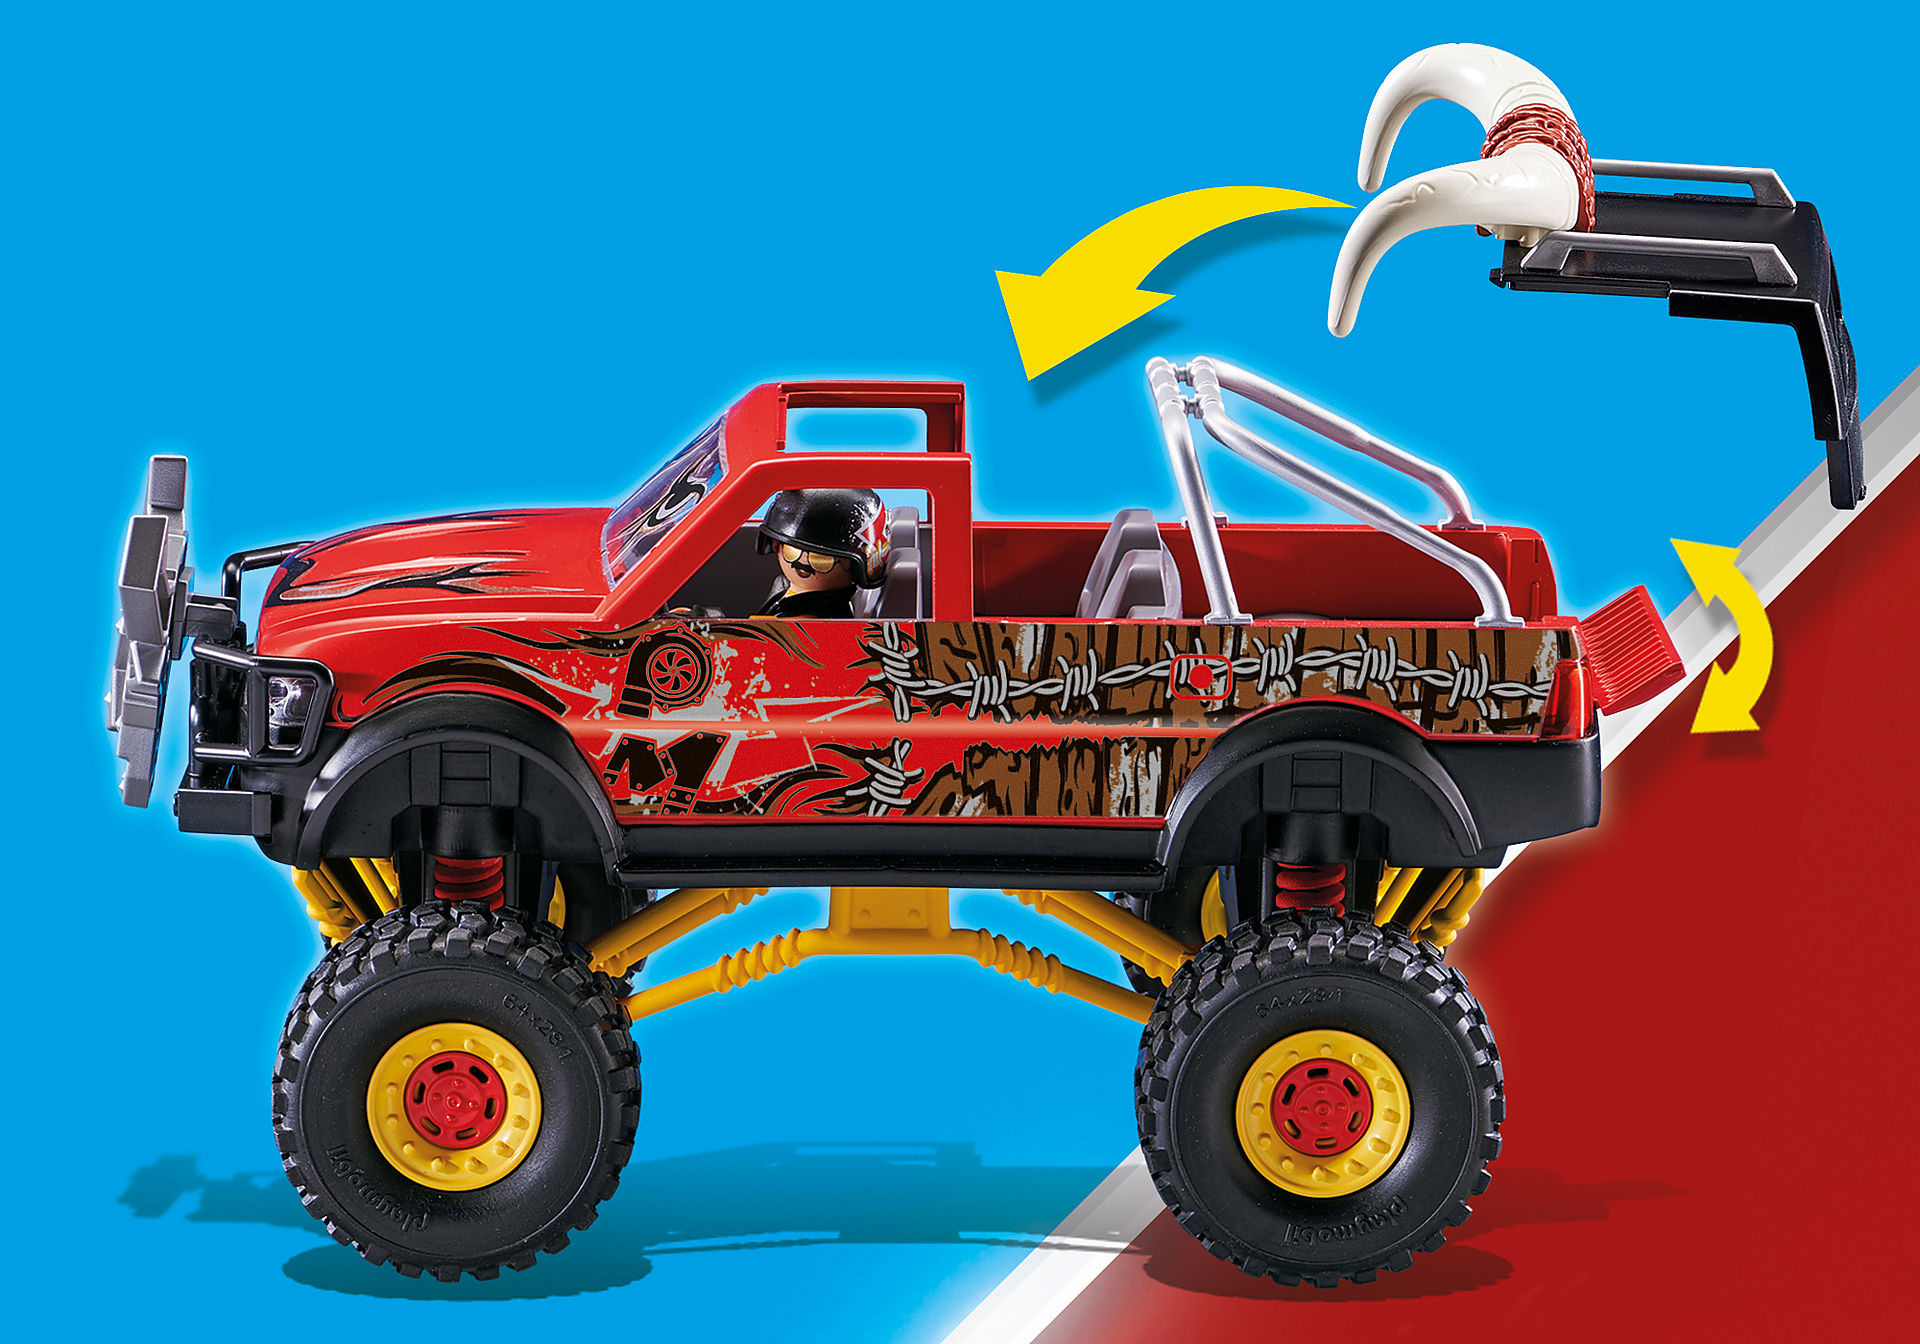 70549 Pokaz kaskaderski: Monster Truck Rogacz zoom image6